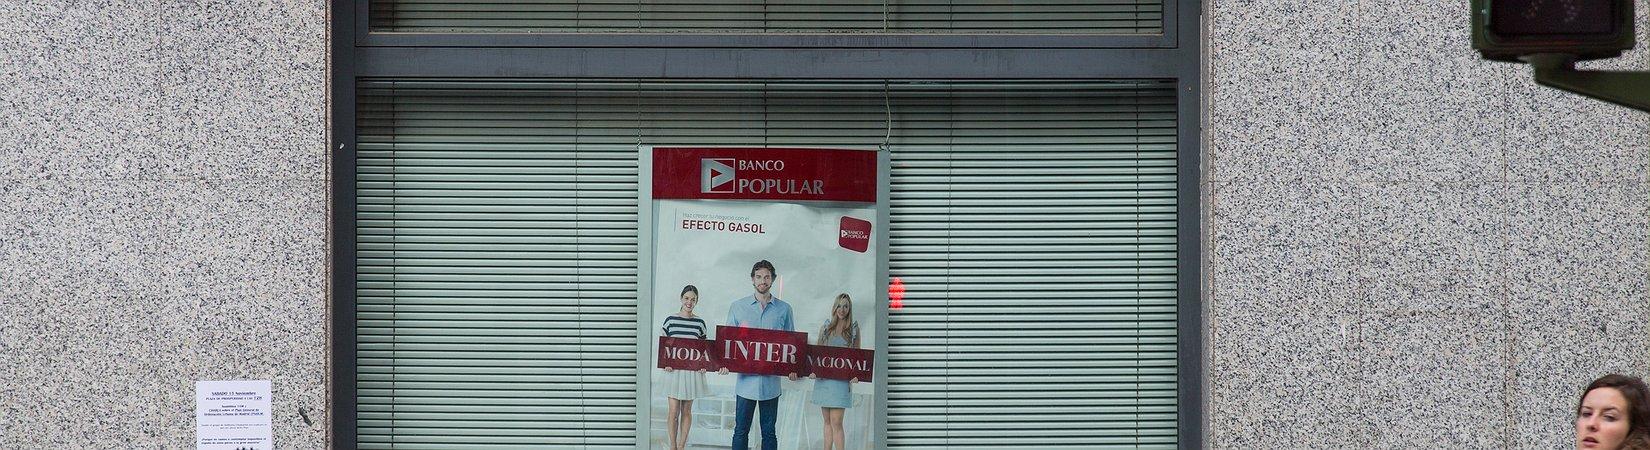 Santander compra Banco Popular per 1 euro